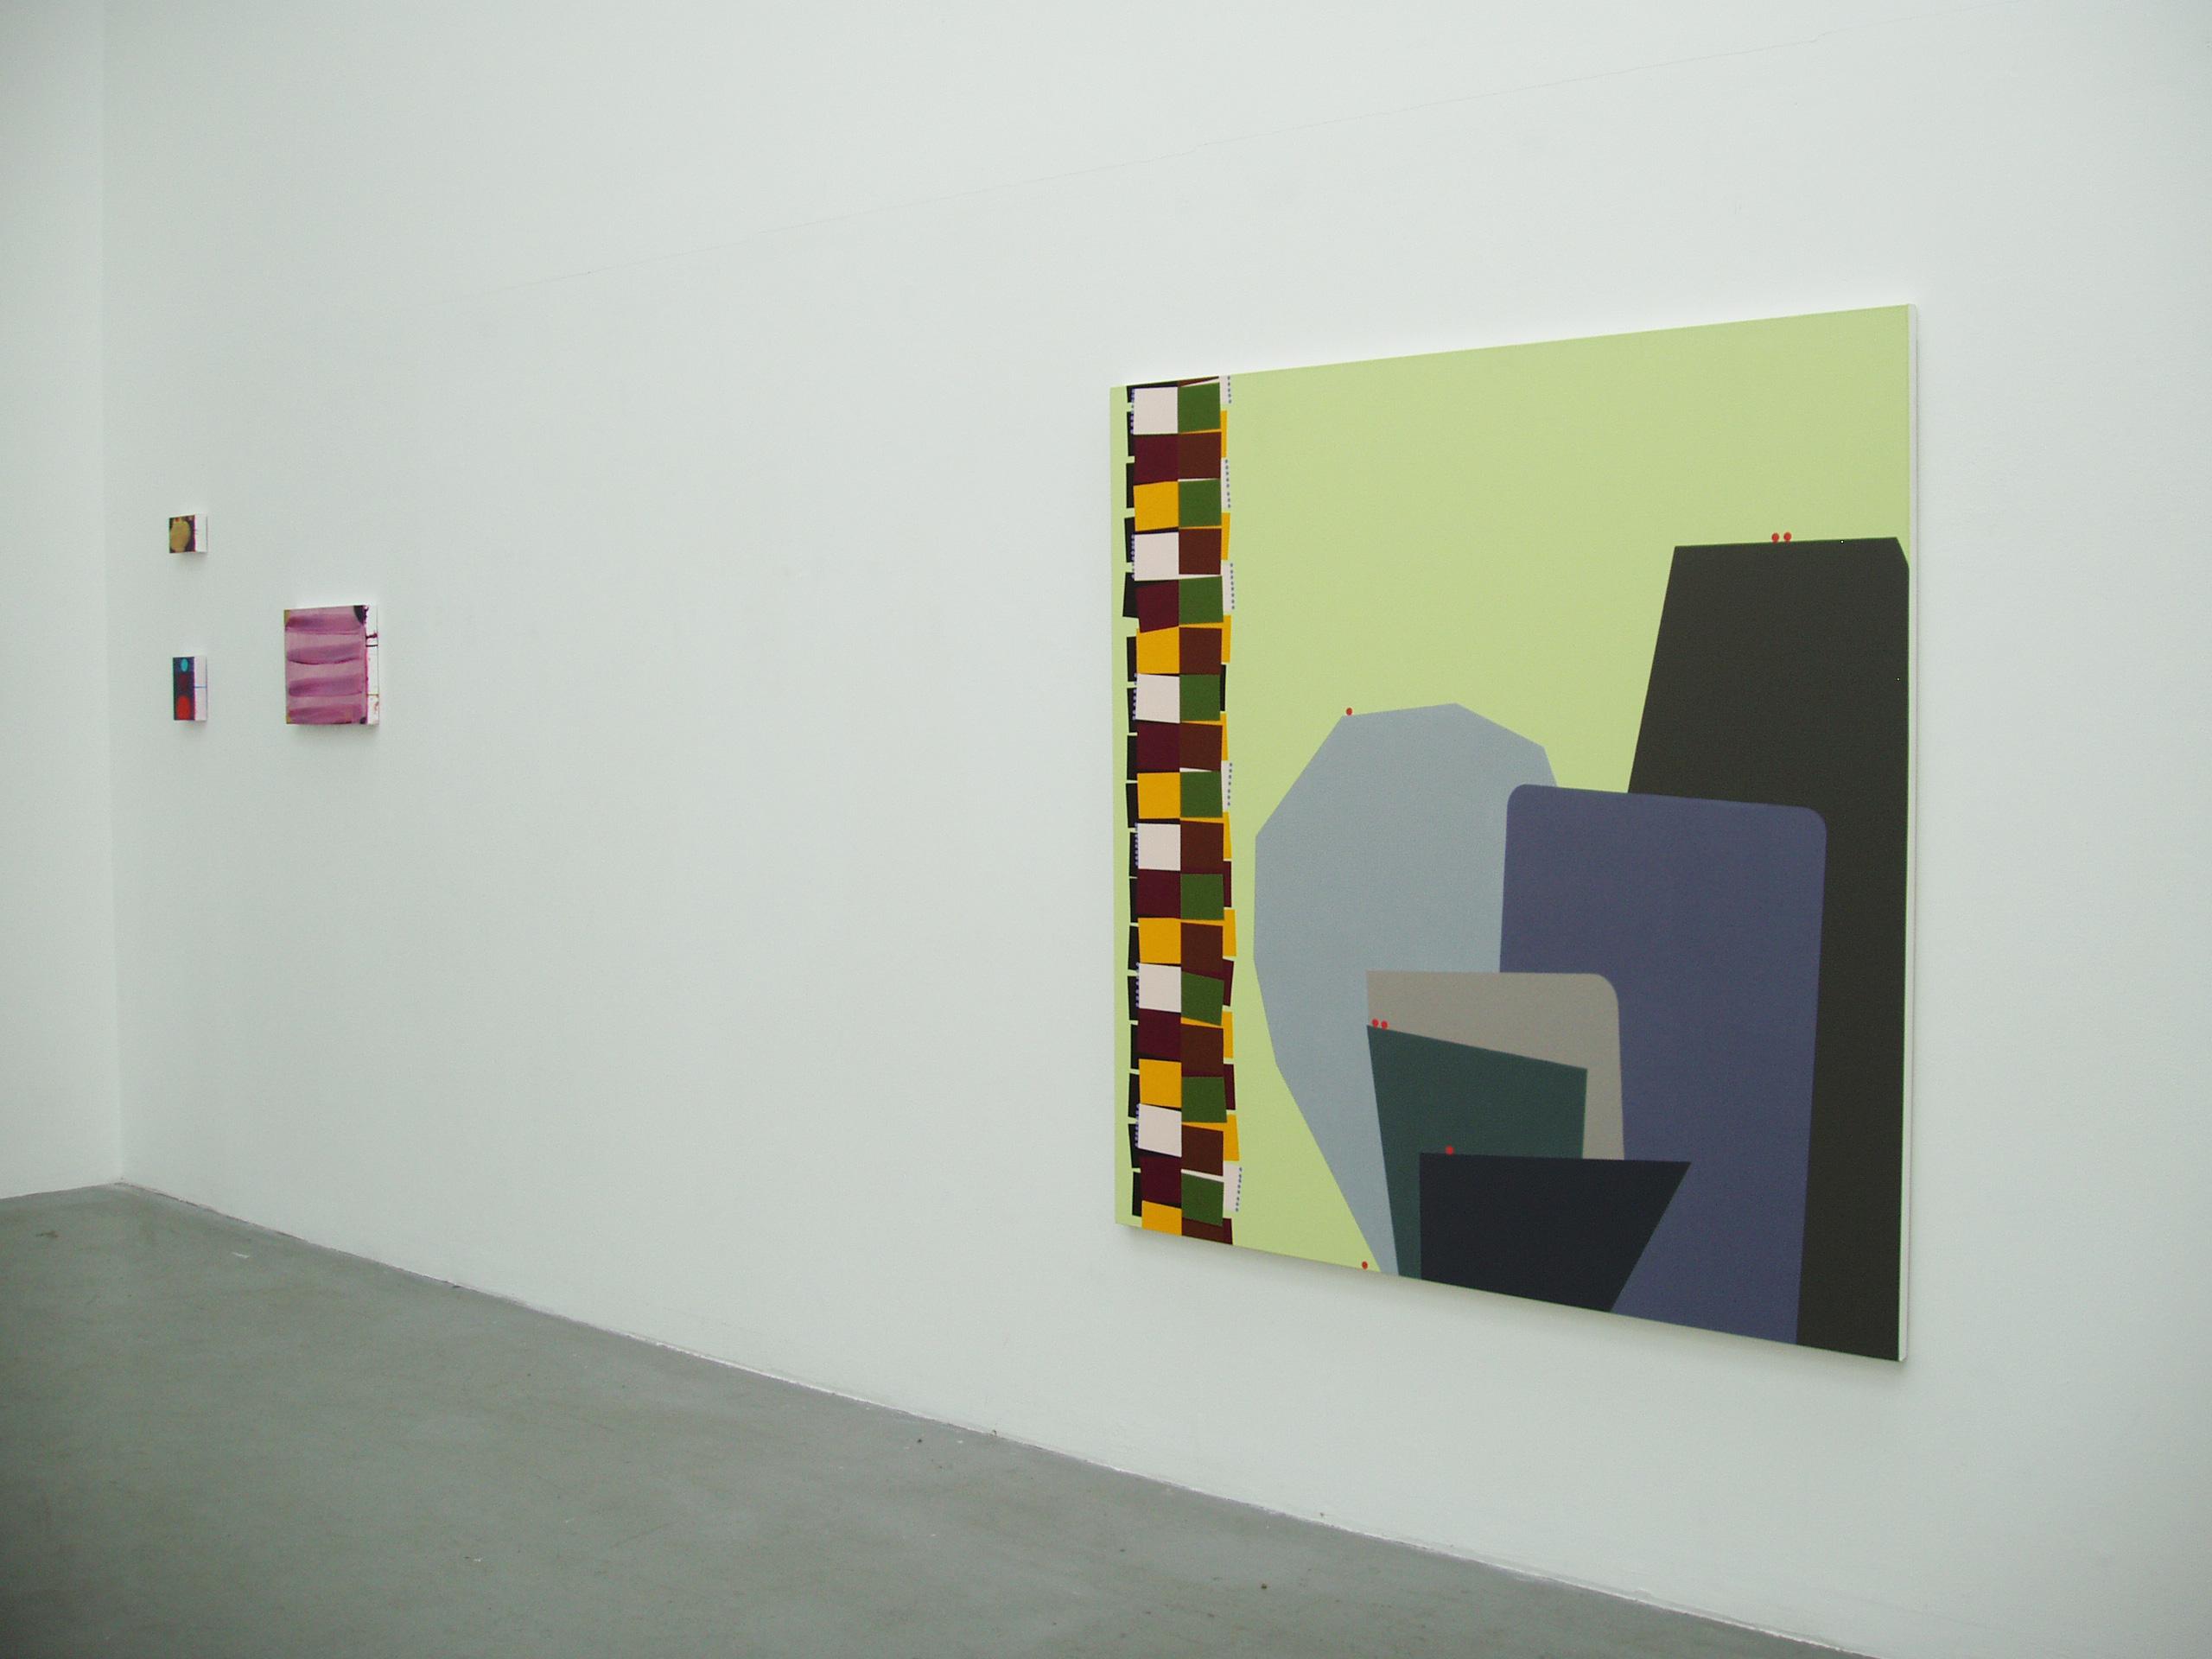 Mali Morris/Daniel Sturgis